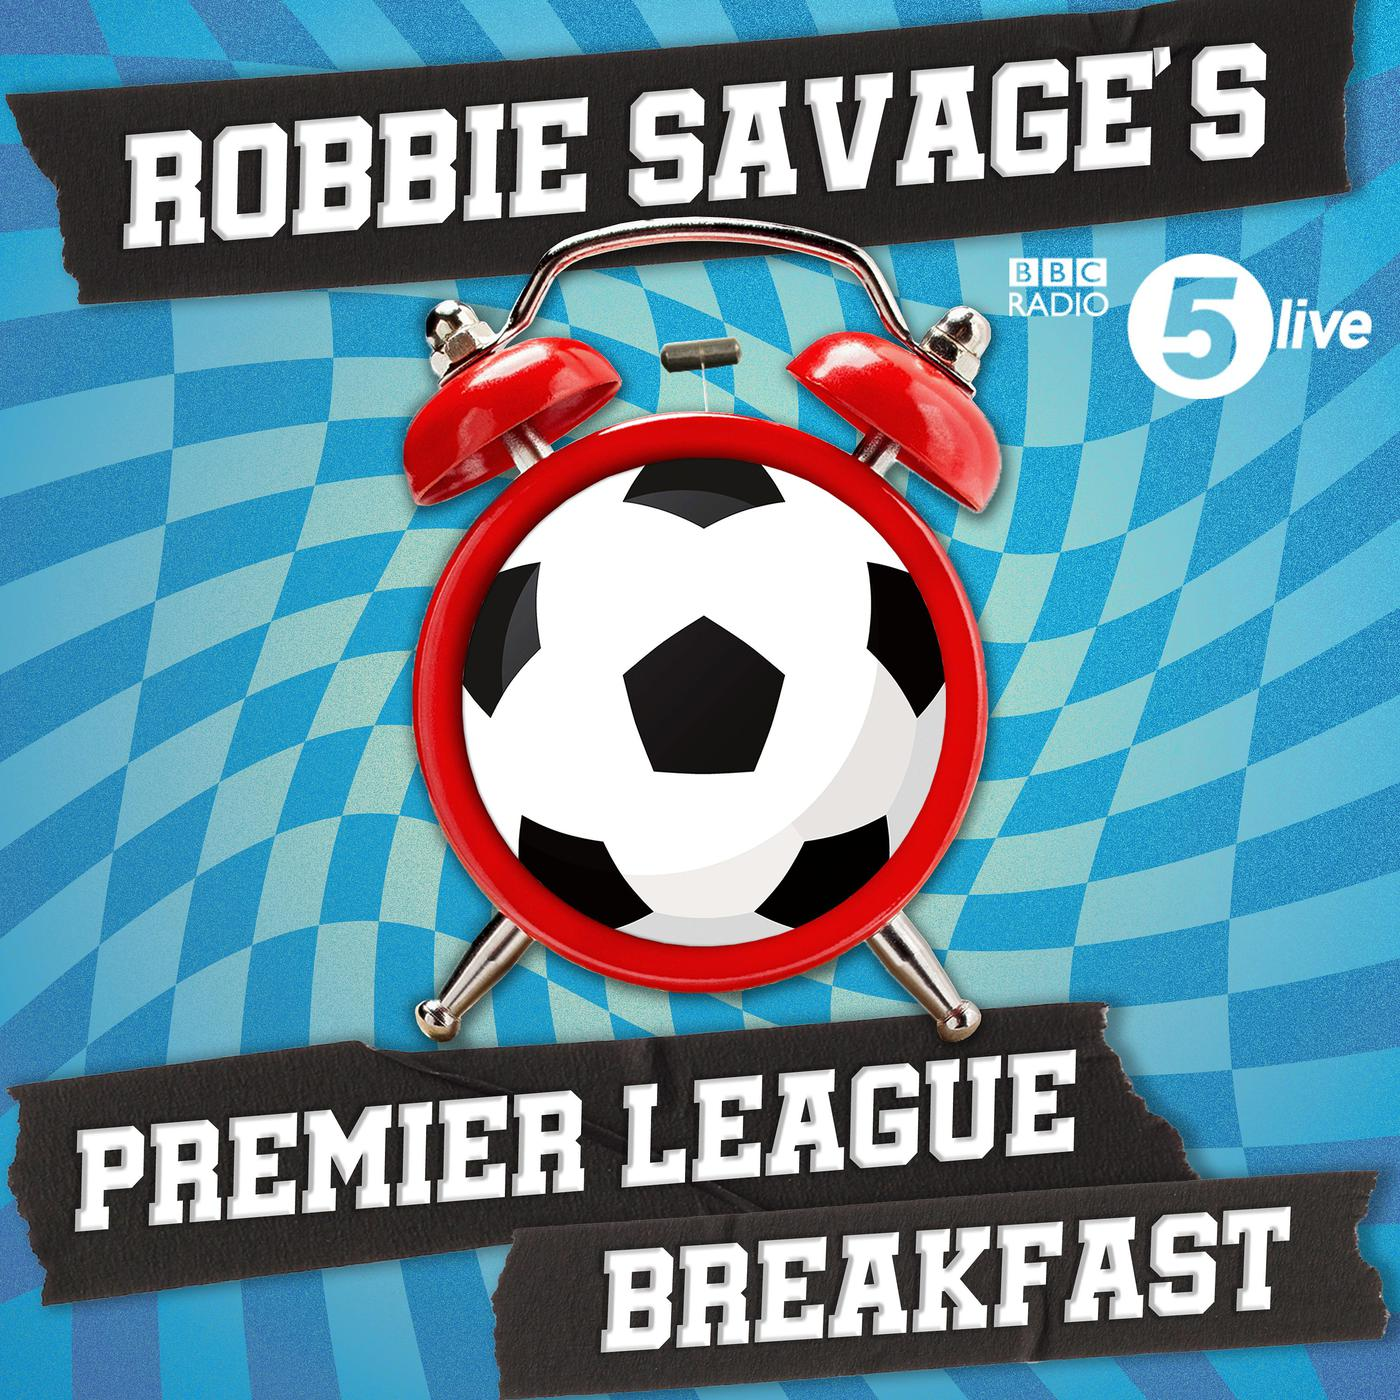 Robbie Savage's Premier League Breakfast (podcast) - BBC